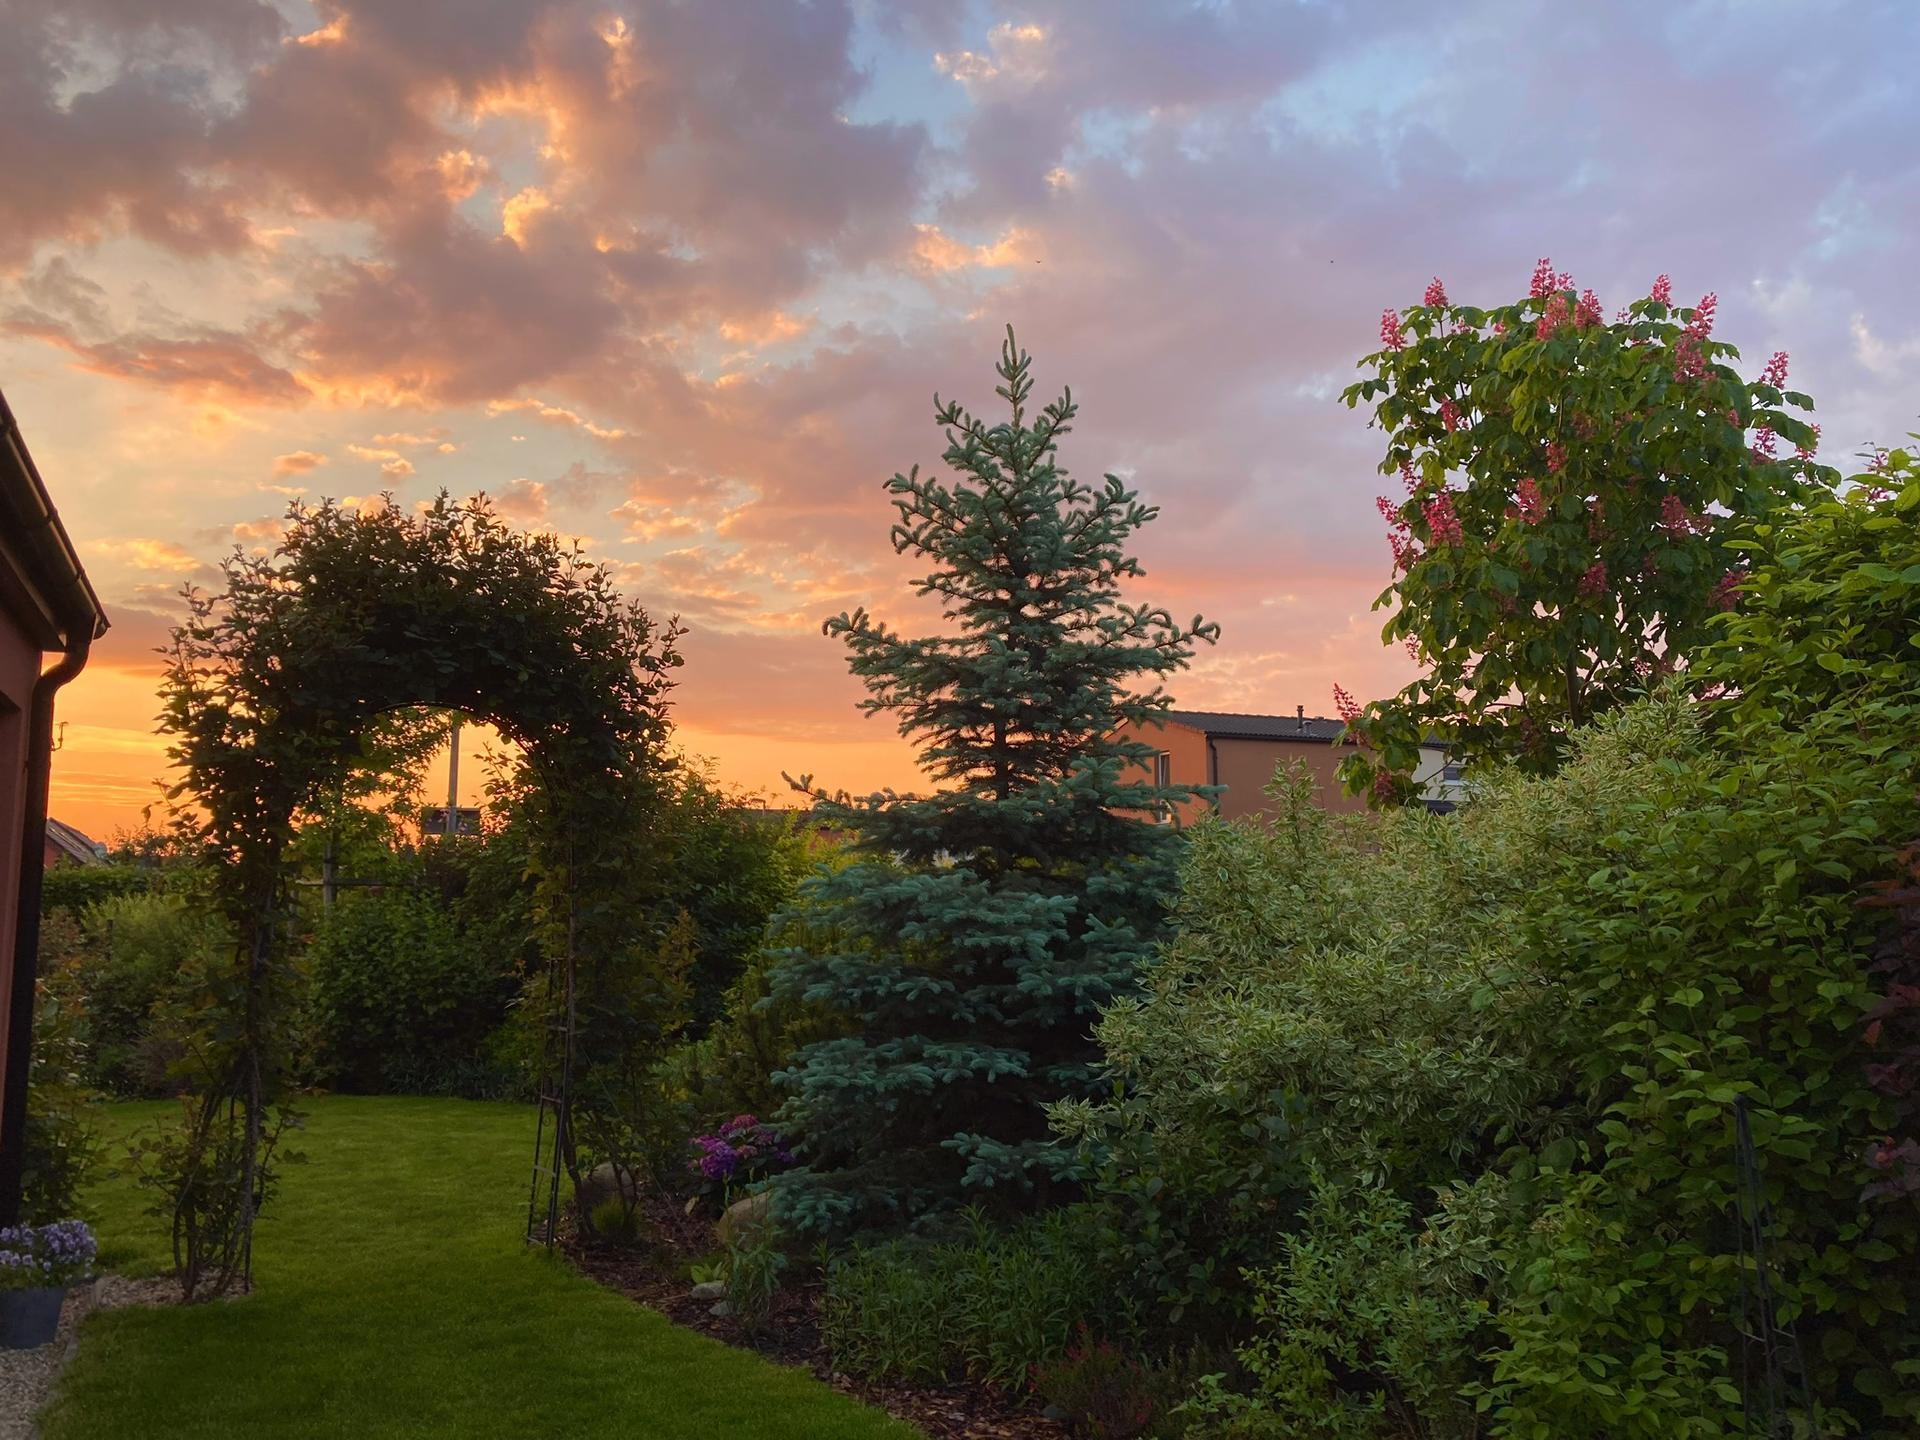 Zahrada 2021 - svitani... pet rano.... poustim kocky domu z toulacky🥰